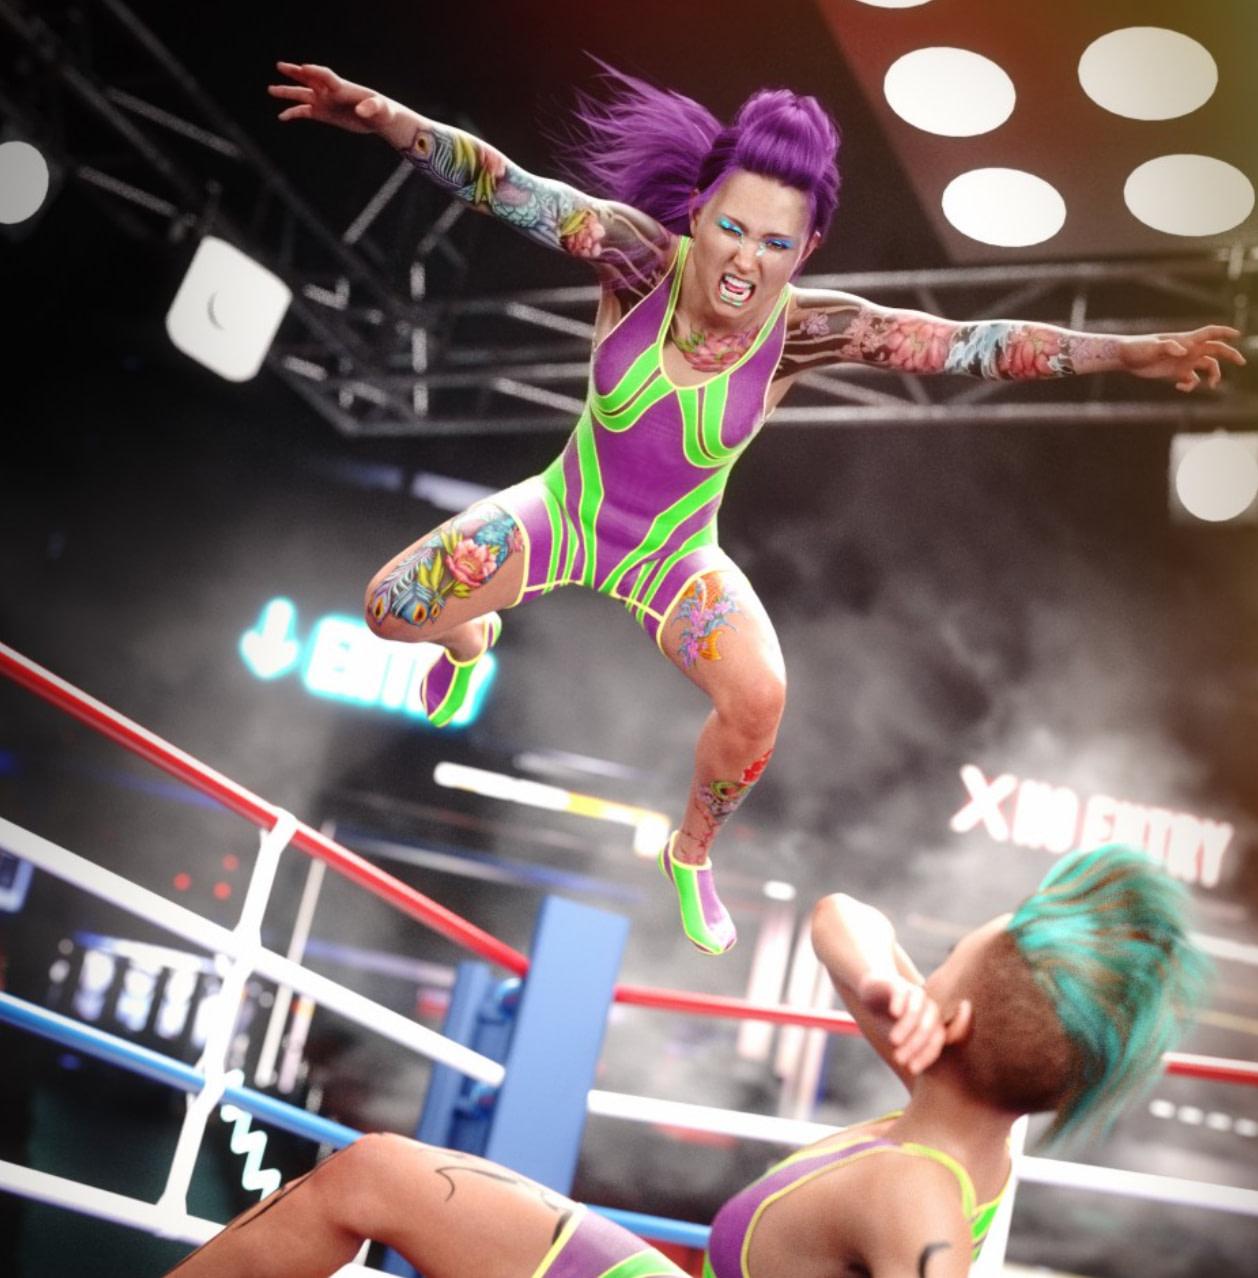 daz amateur wrestler outfit genesis female